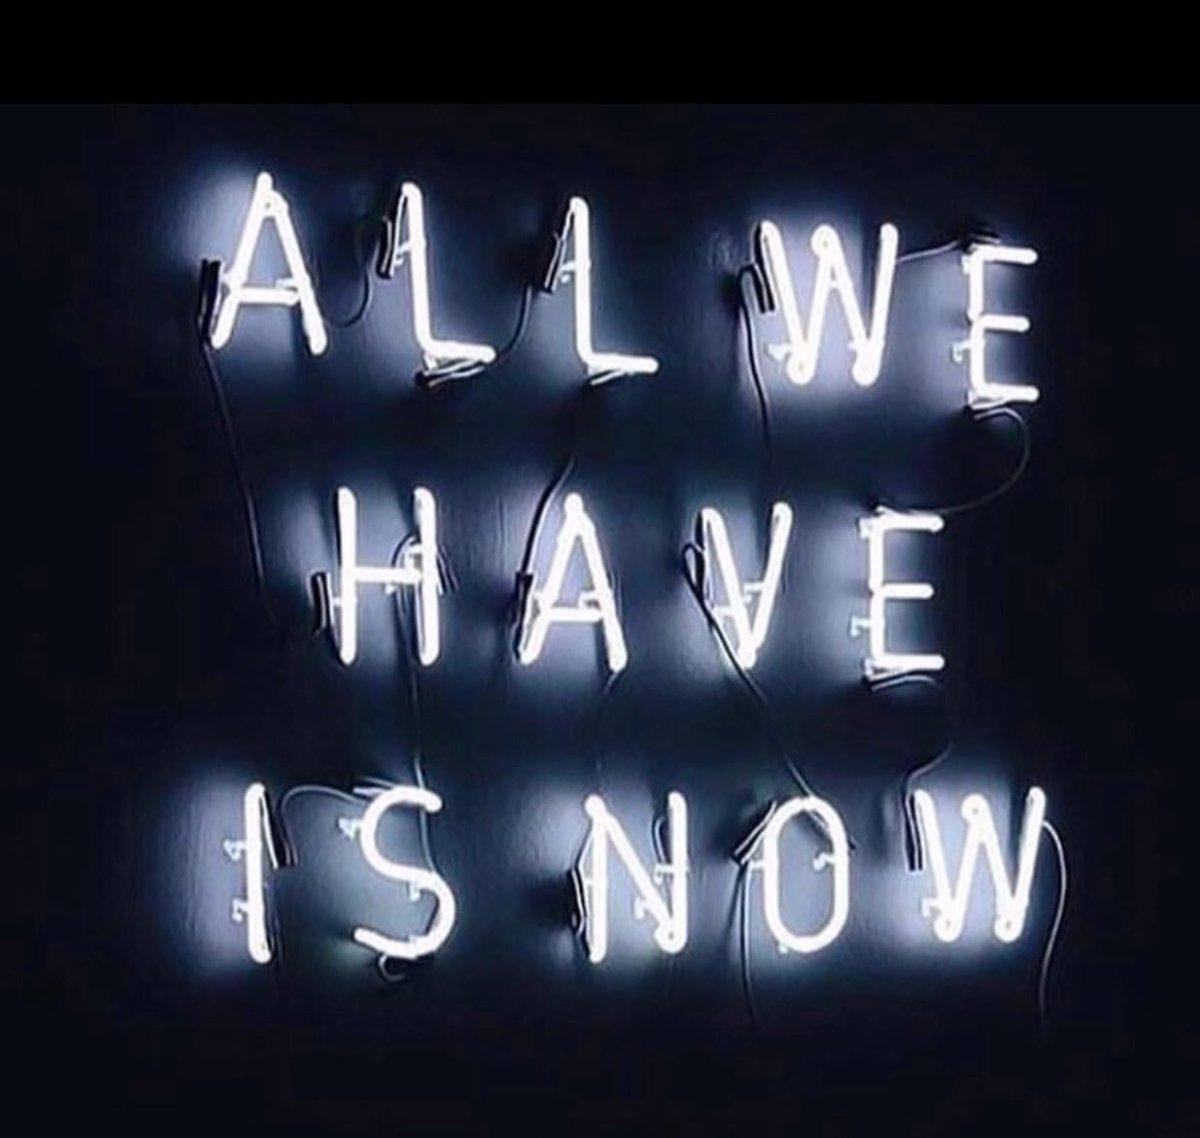 Remember to live in the present #Mindfulness 2U7fUZ56mO